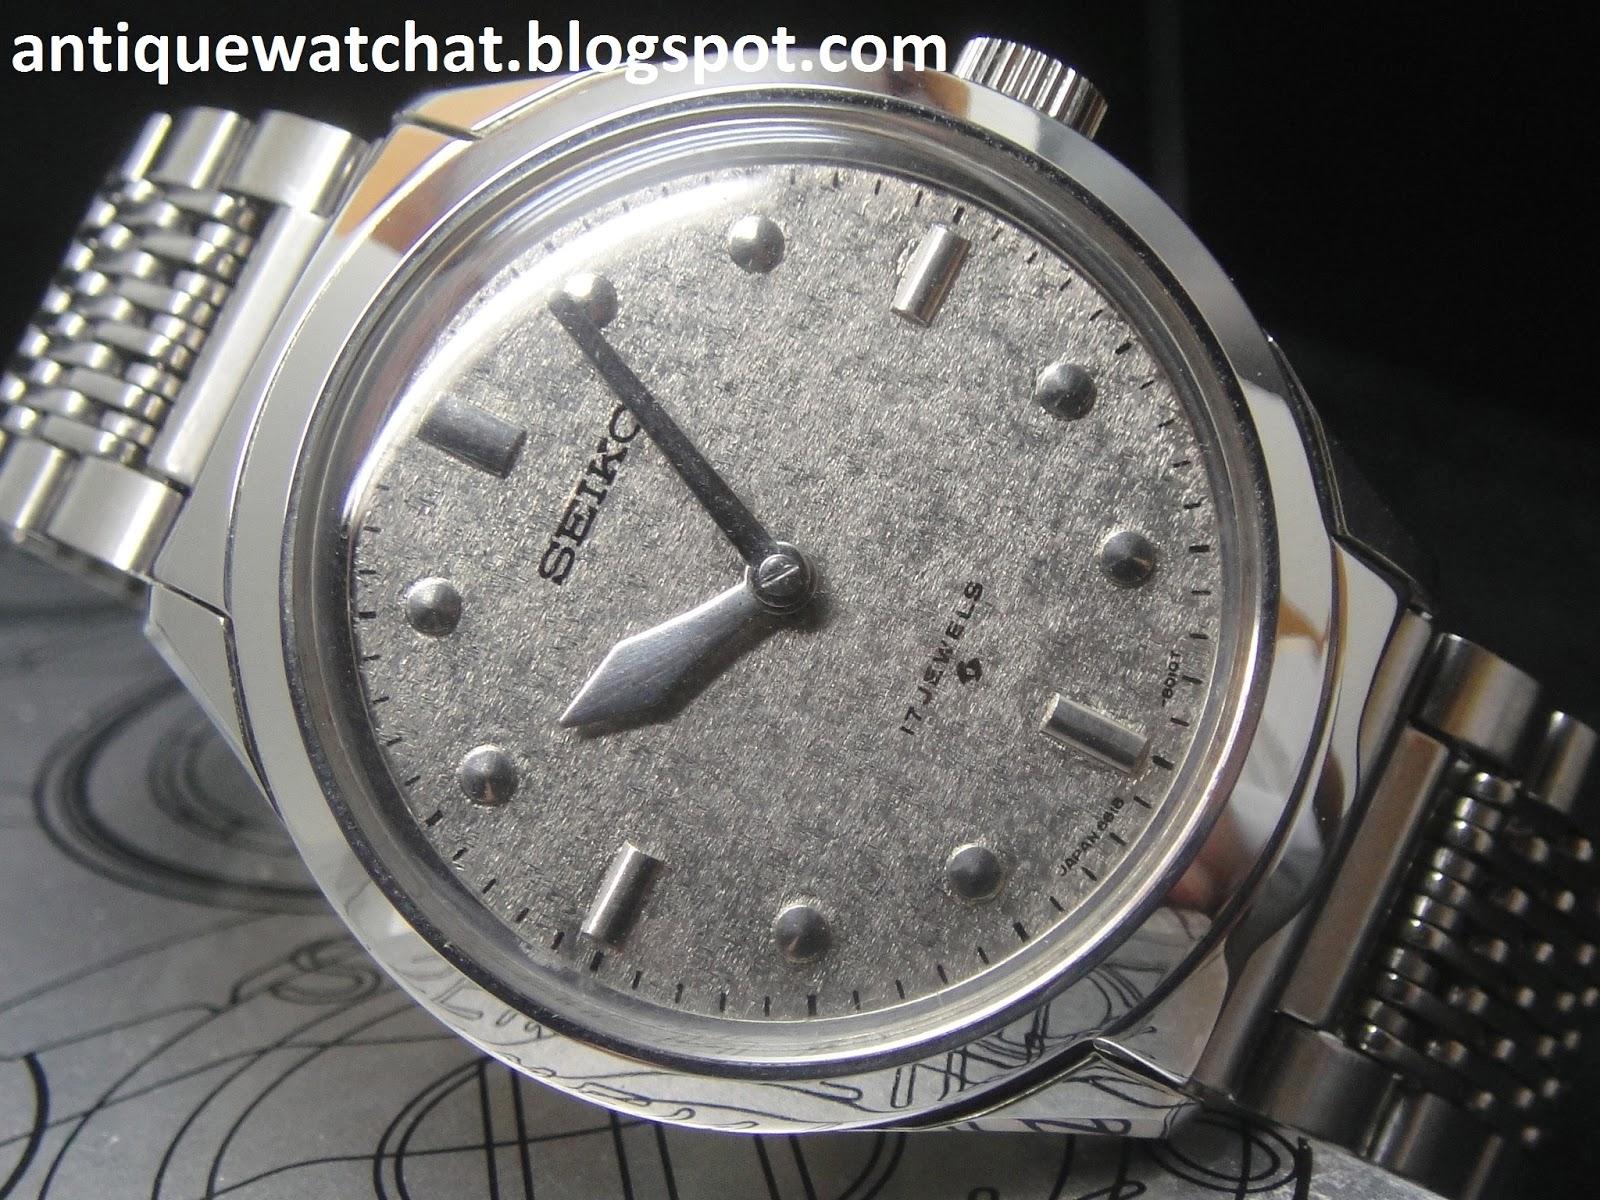 Antique Watch Bar Seiko Blind Watch 66188001 Sbw02 (sold. Diamond Wedding Rings For Women. Tiara Engagement Rings. Wedding Band Diamond. Style Bracelet. Nautical Bracelet. Carbide Rings. Carat Diamond. Cat Rings